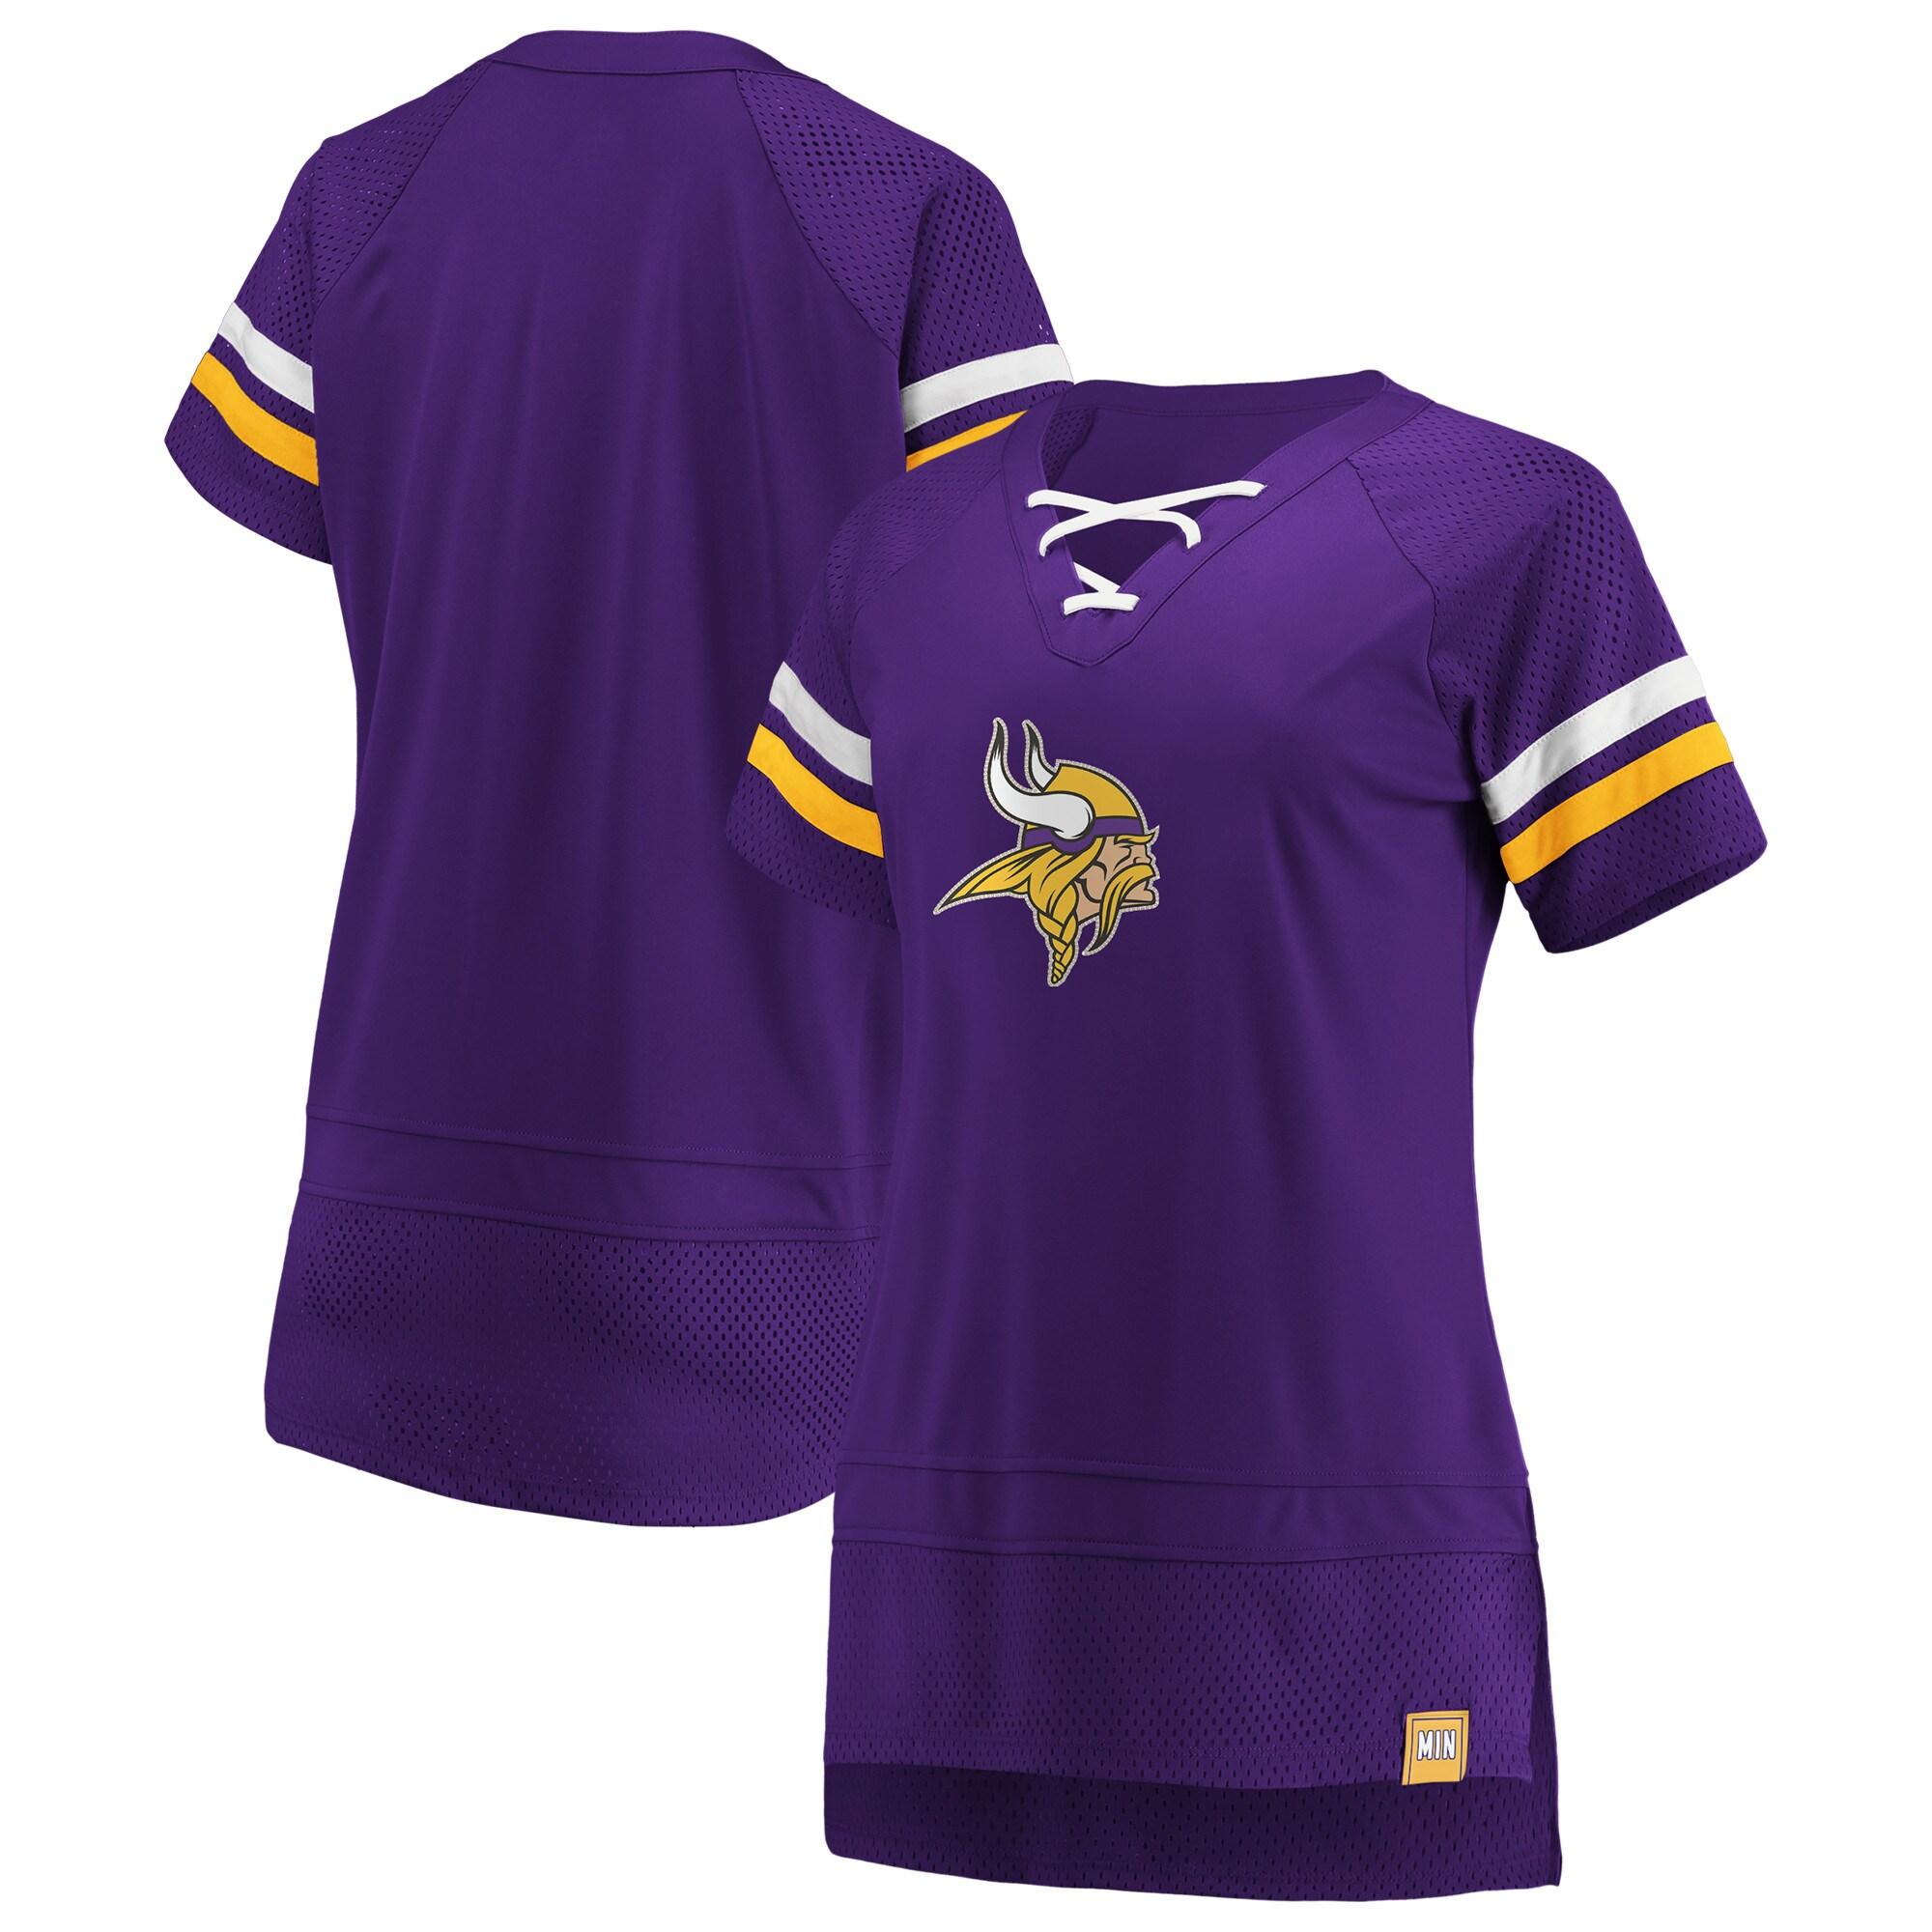 Minnesota Vikings Fanatics Branded Women's Draft Me Lace Up T-Shirt - Purple/Gold